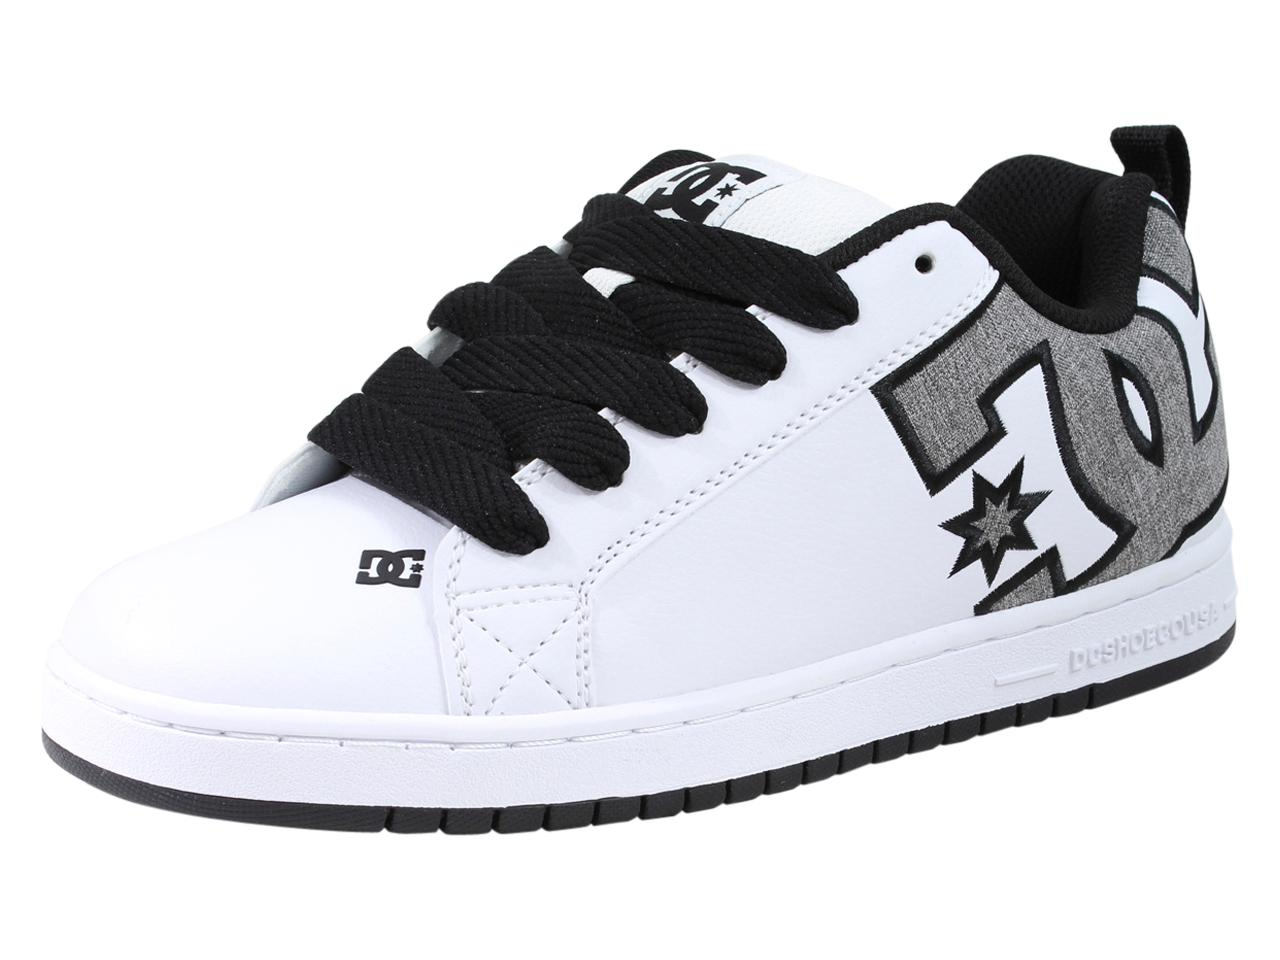 Image of DC Men's Court Graffik SE Skateboarding Sneakers Shoes - White/Heather Grey Leather - 9.5 D(M) US